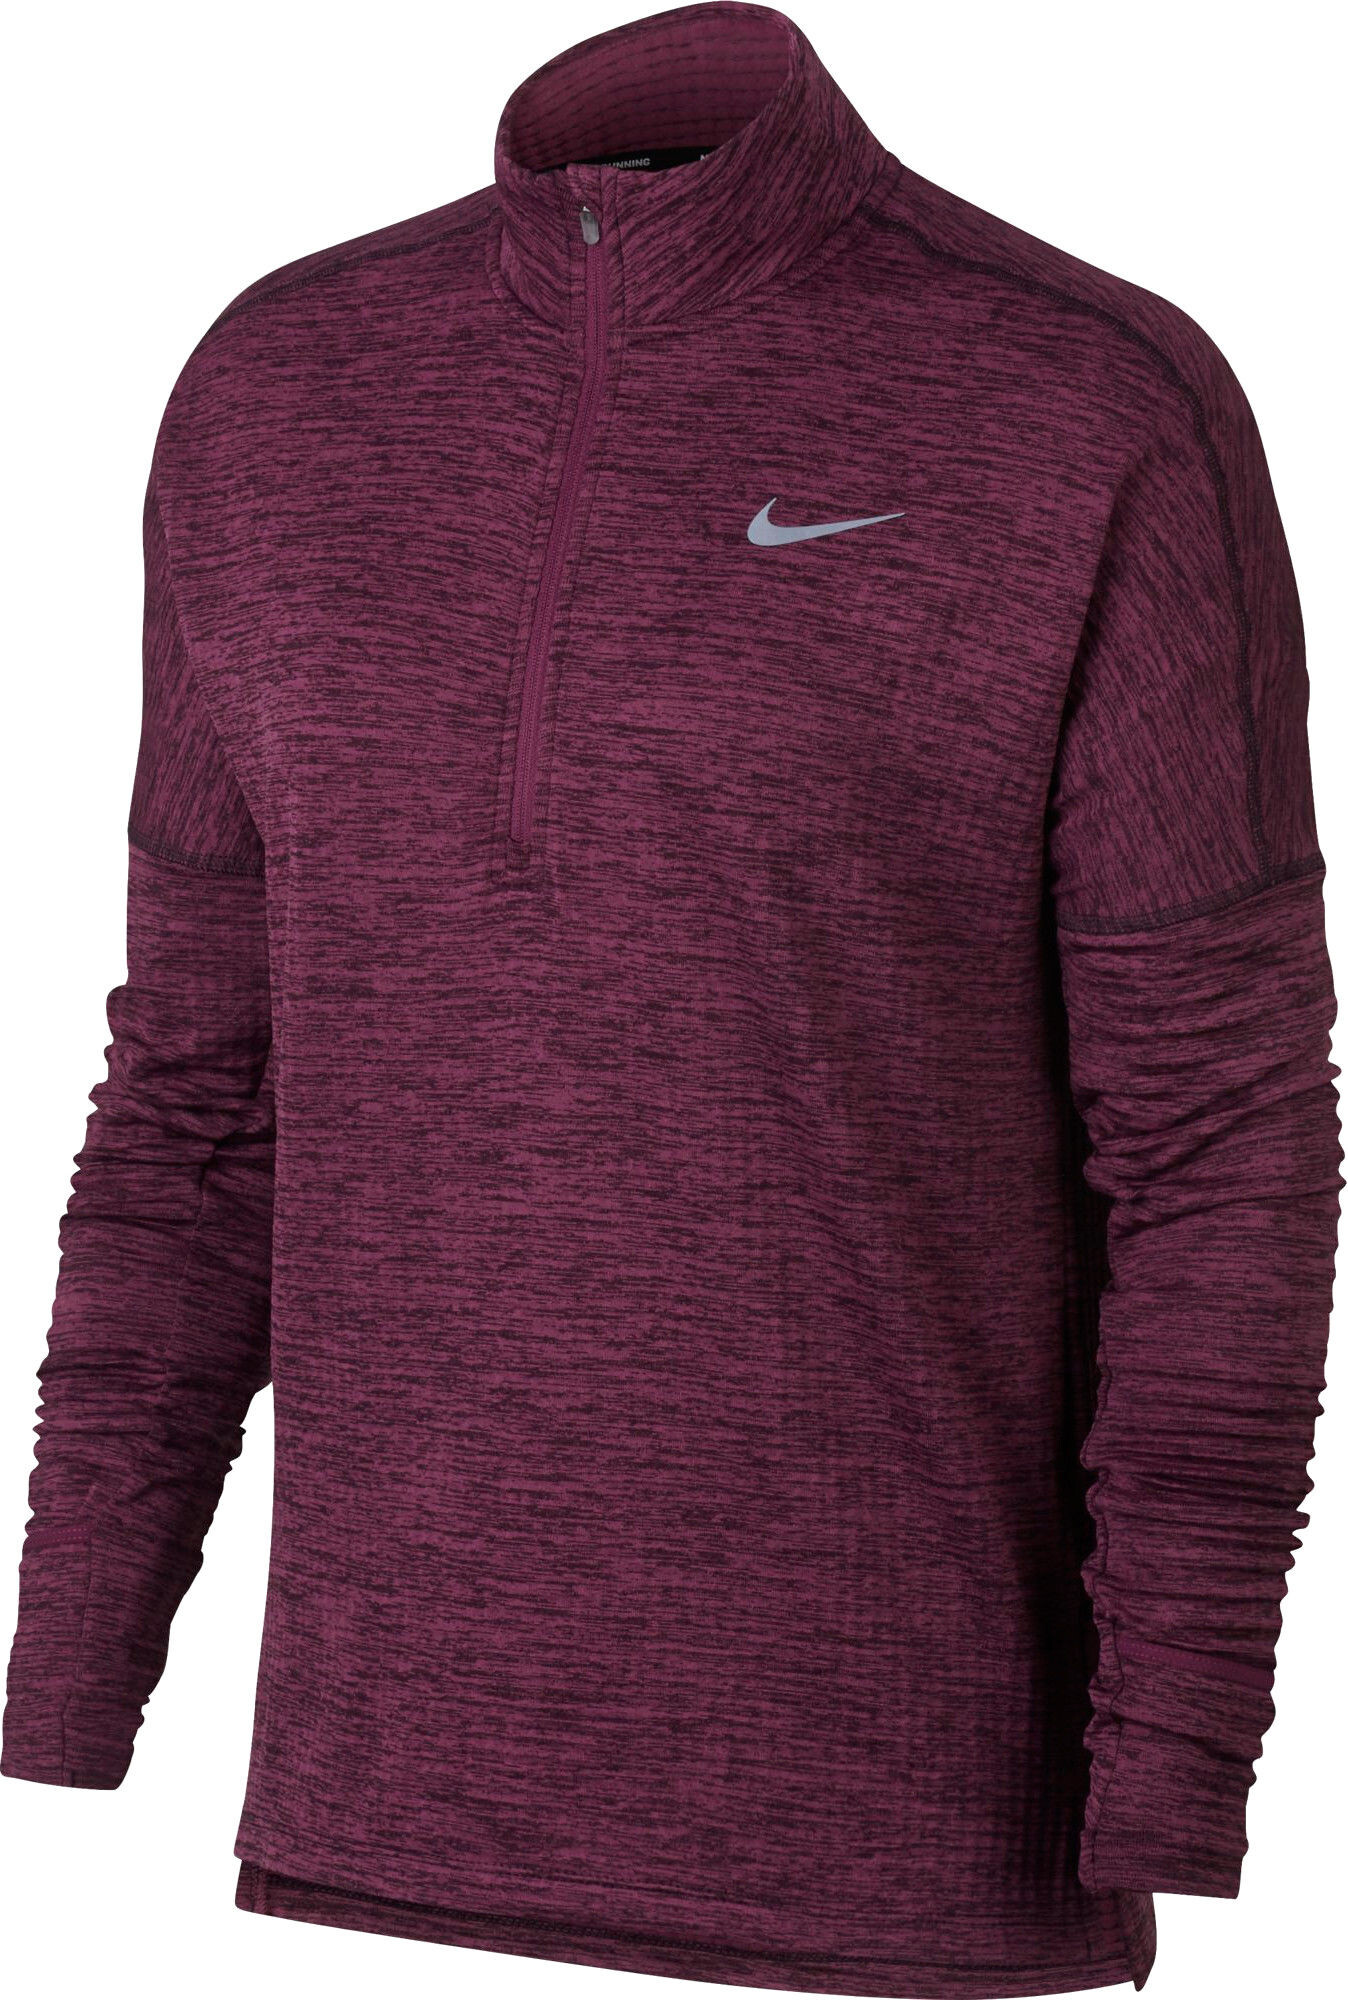 7b344d1c0bd Nike Therma Sphere Element Hardloopshirt lange mouwen Dames rood I ...